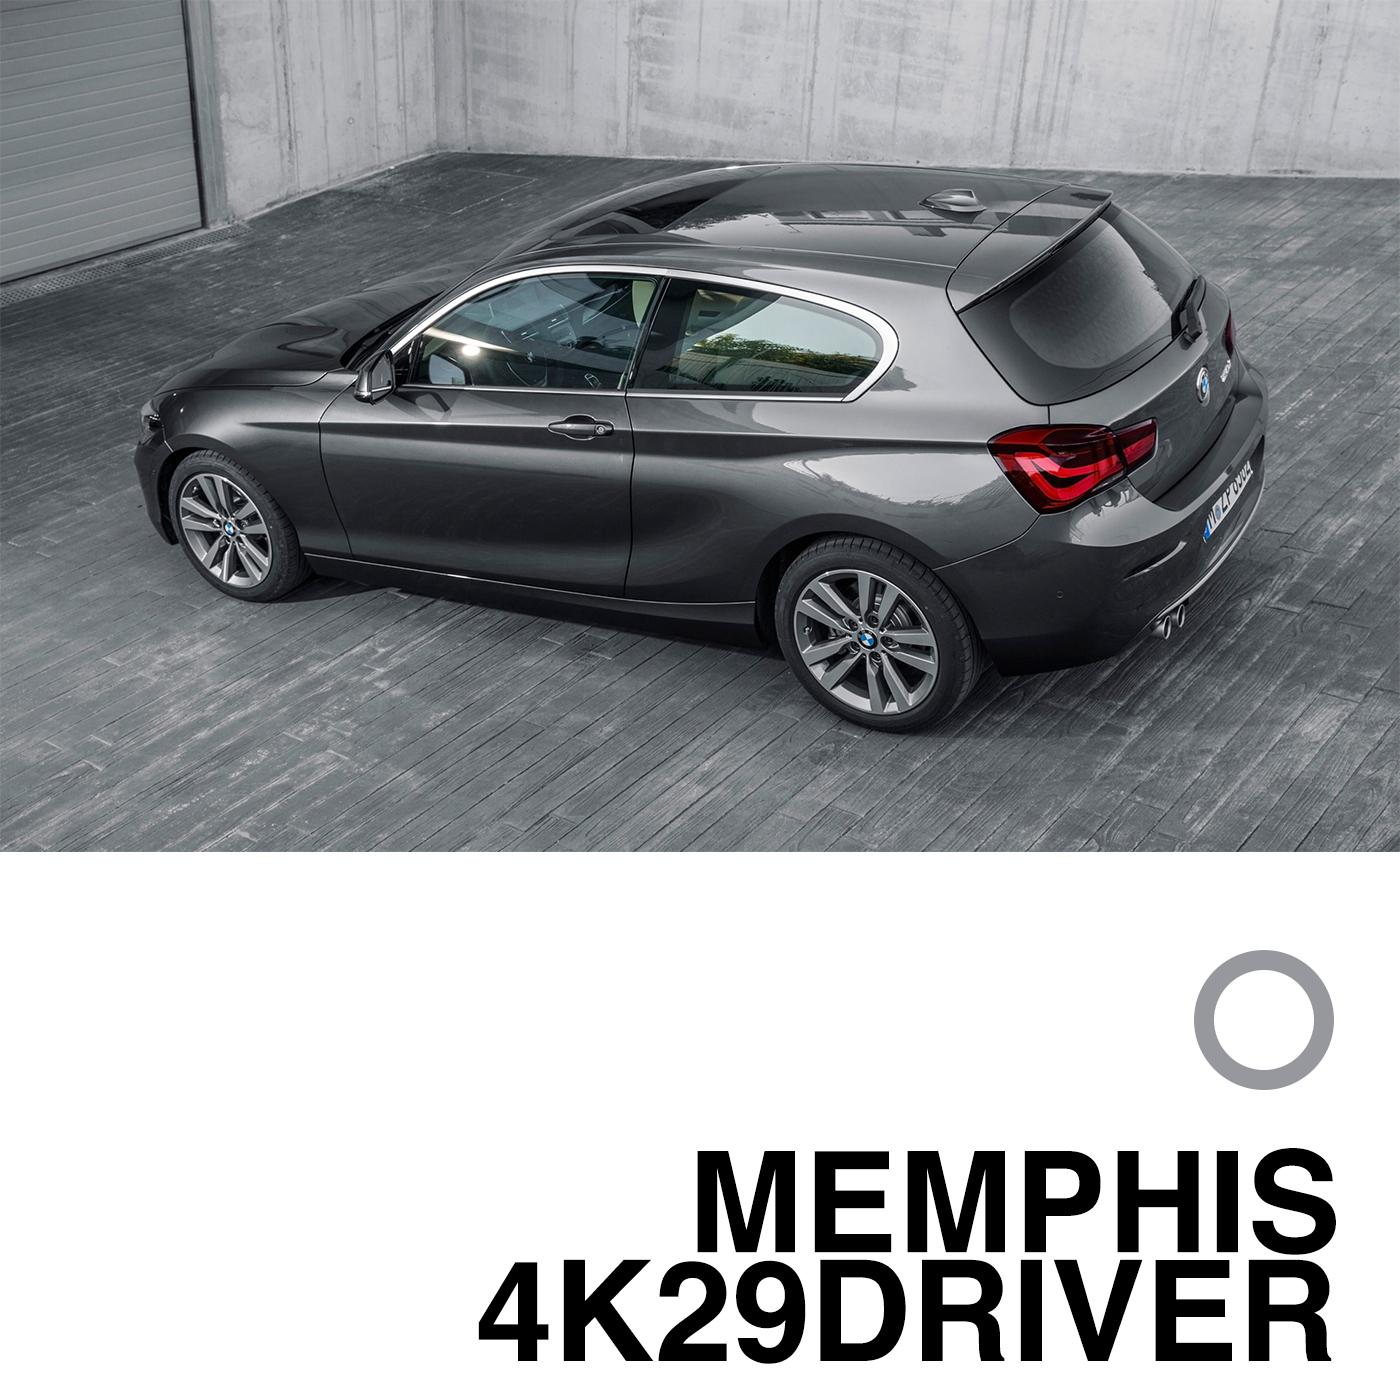 MEMPHIS 4K29DRIVER MOBILE640